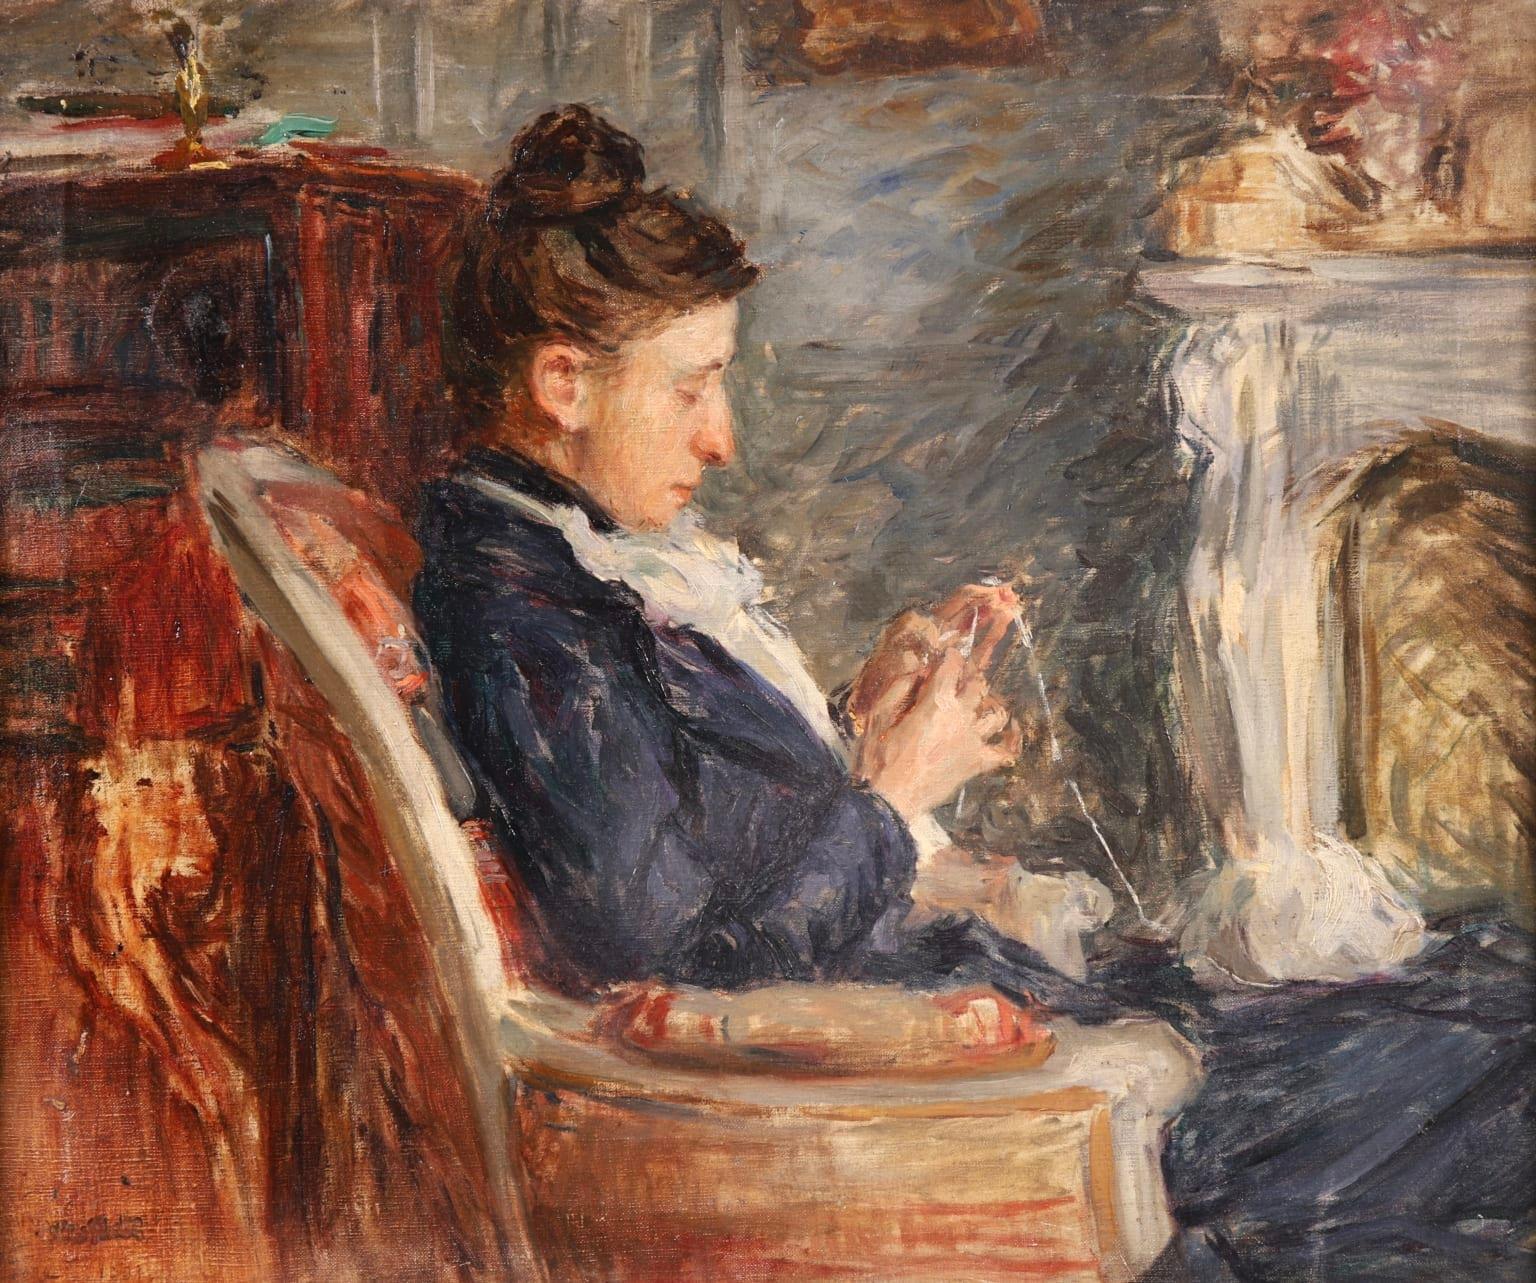 Woman Crocheting - Impressionist Oil, Figure in Interior by Norbert Goeneutte